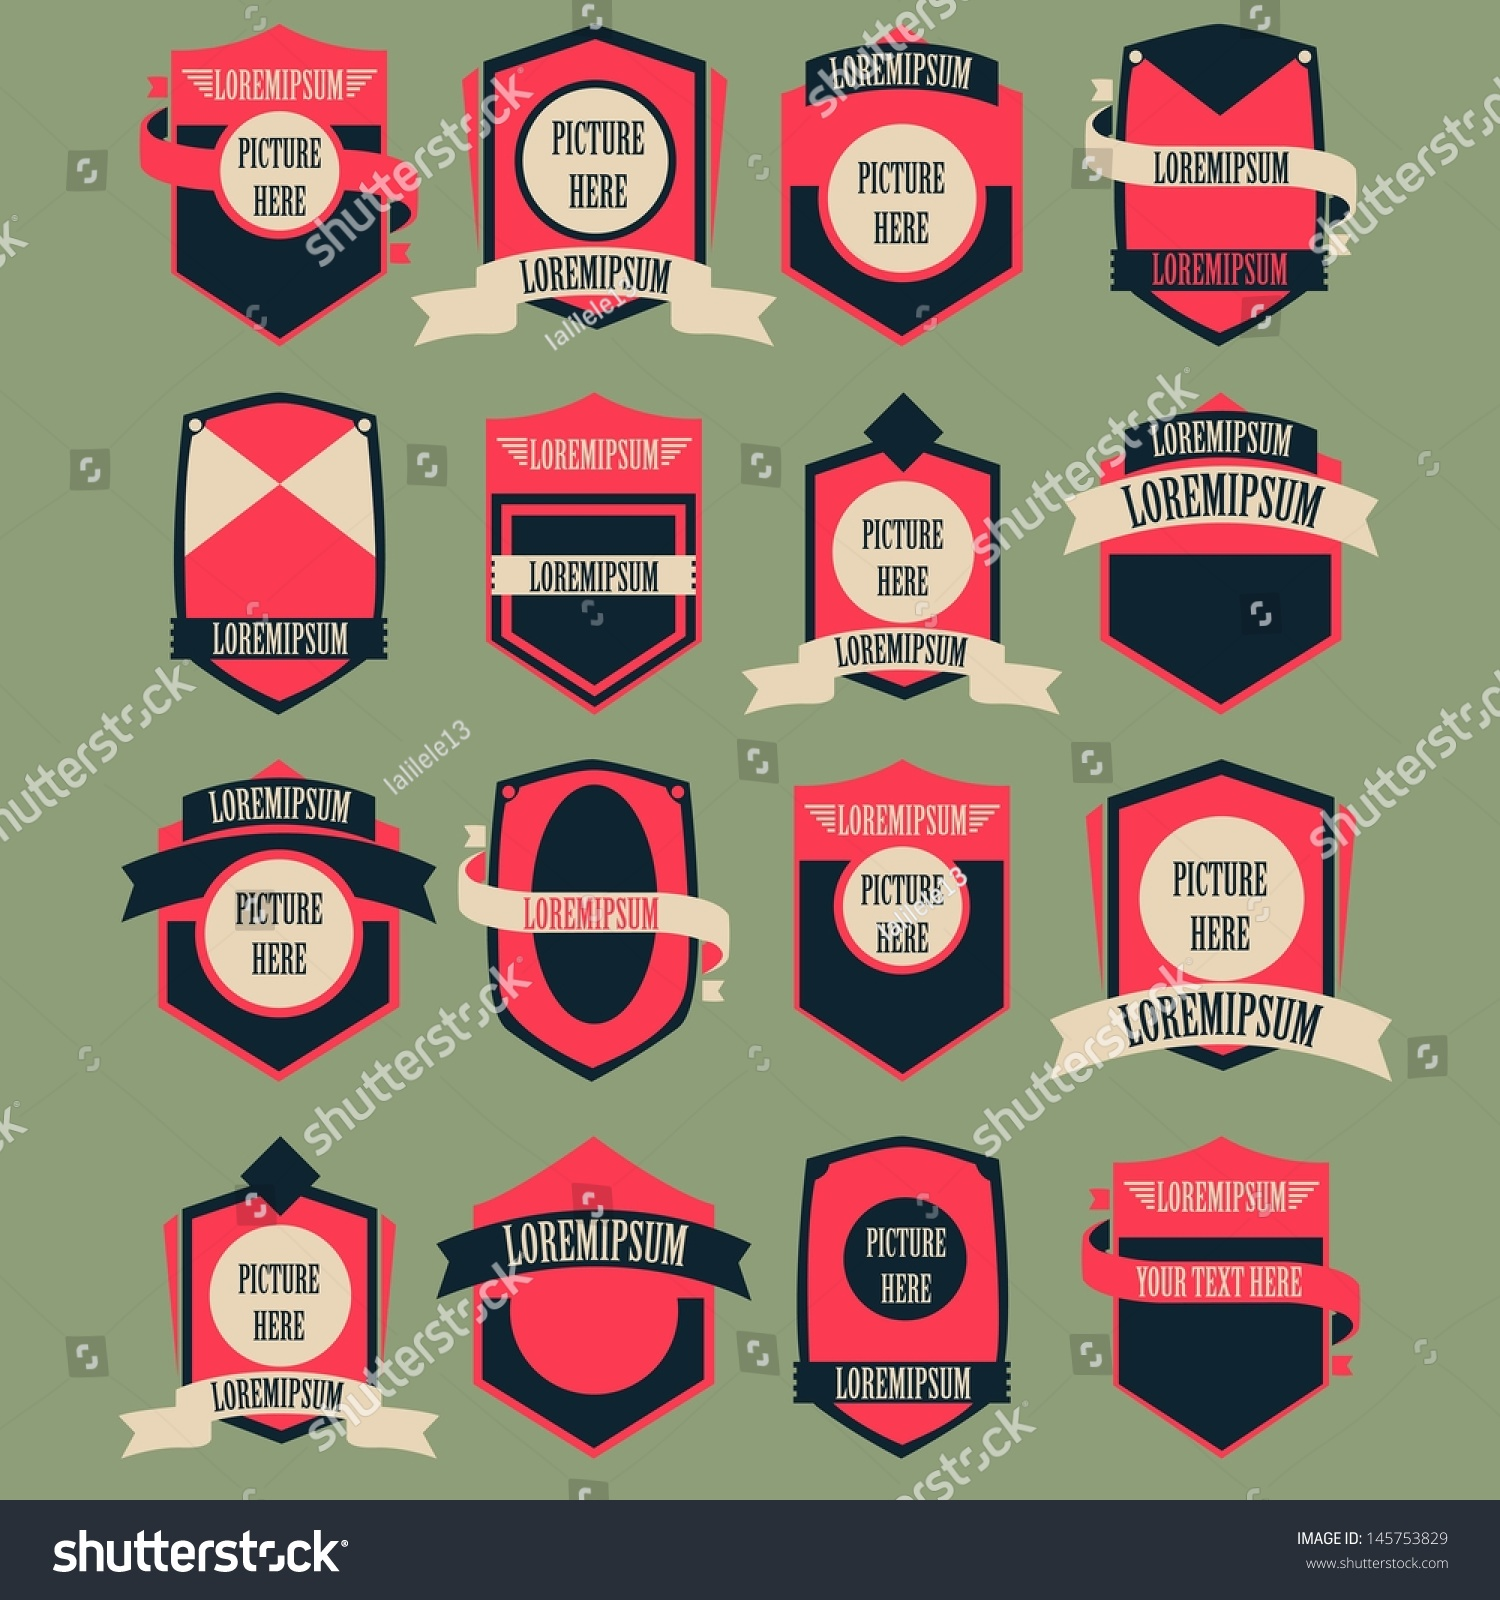 Vintage Logo Vector Set Stock Vector 145753829 - Shutterstock